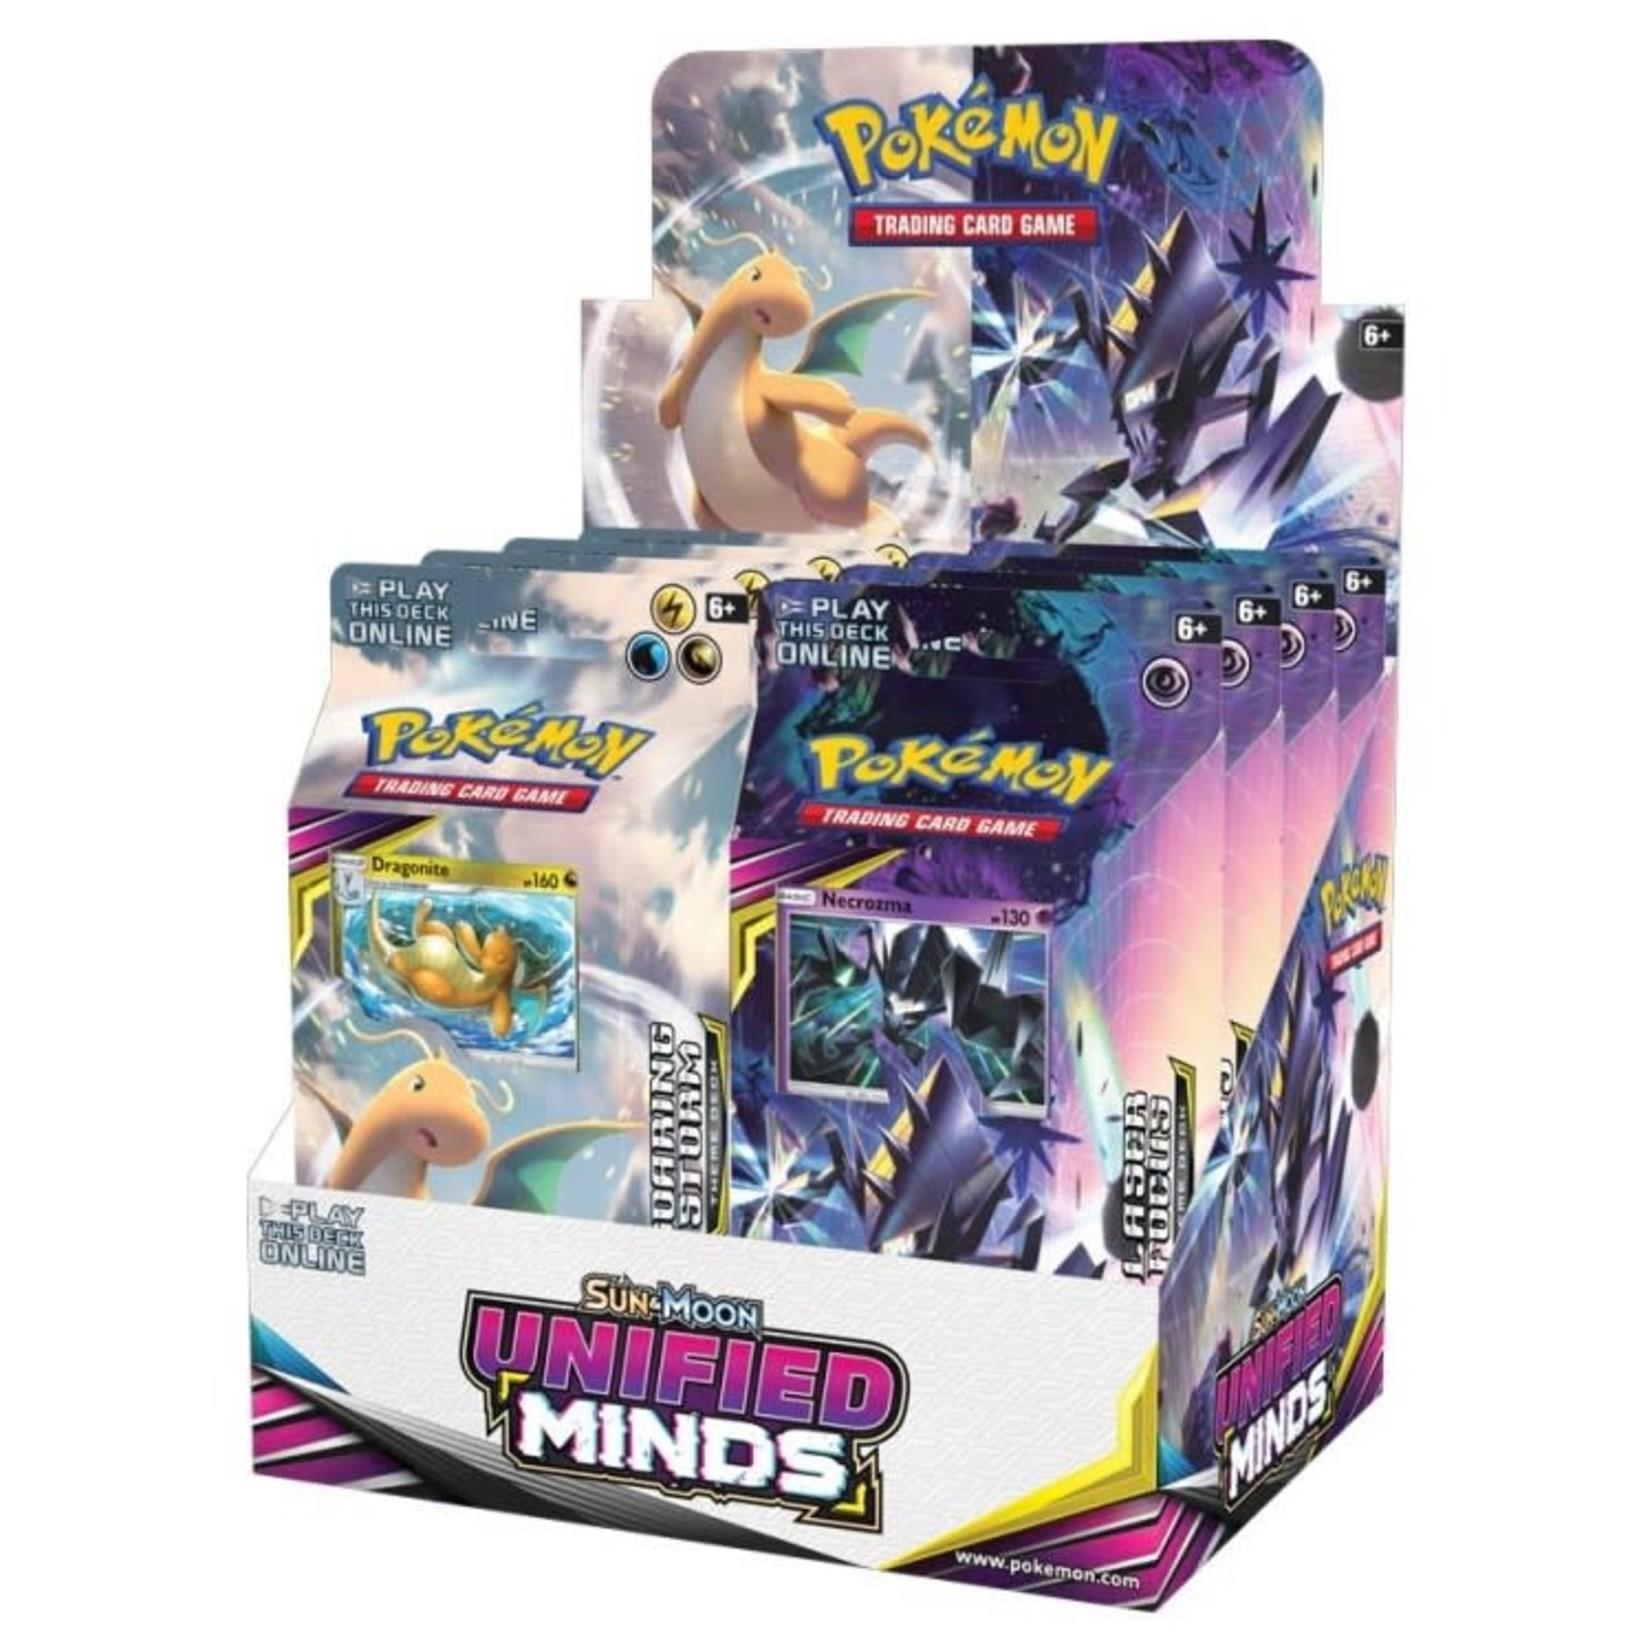 Pokemon International Pokemon Trading Card Game: Unified Minds Theme Deck